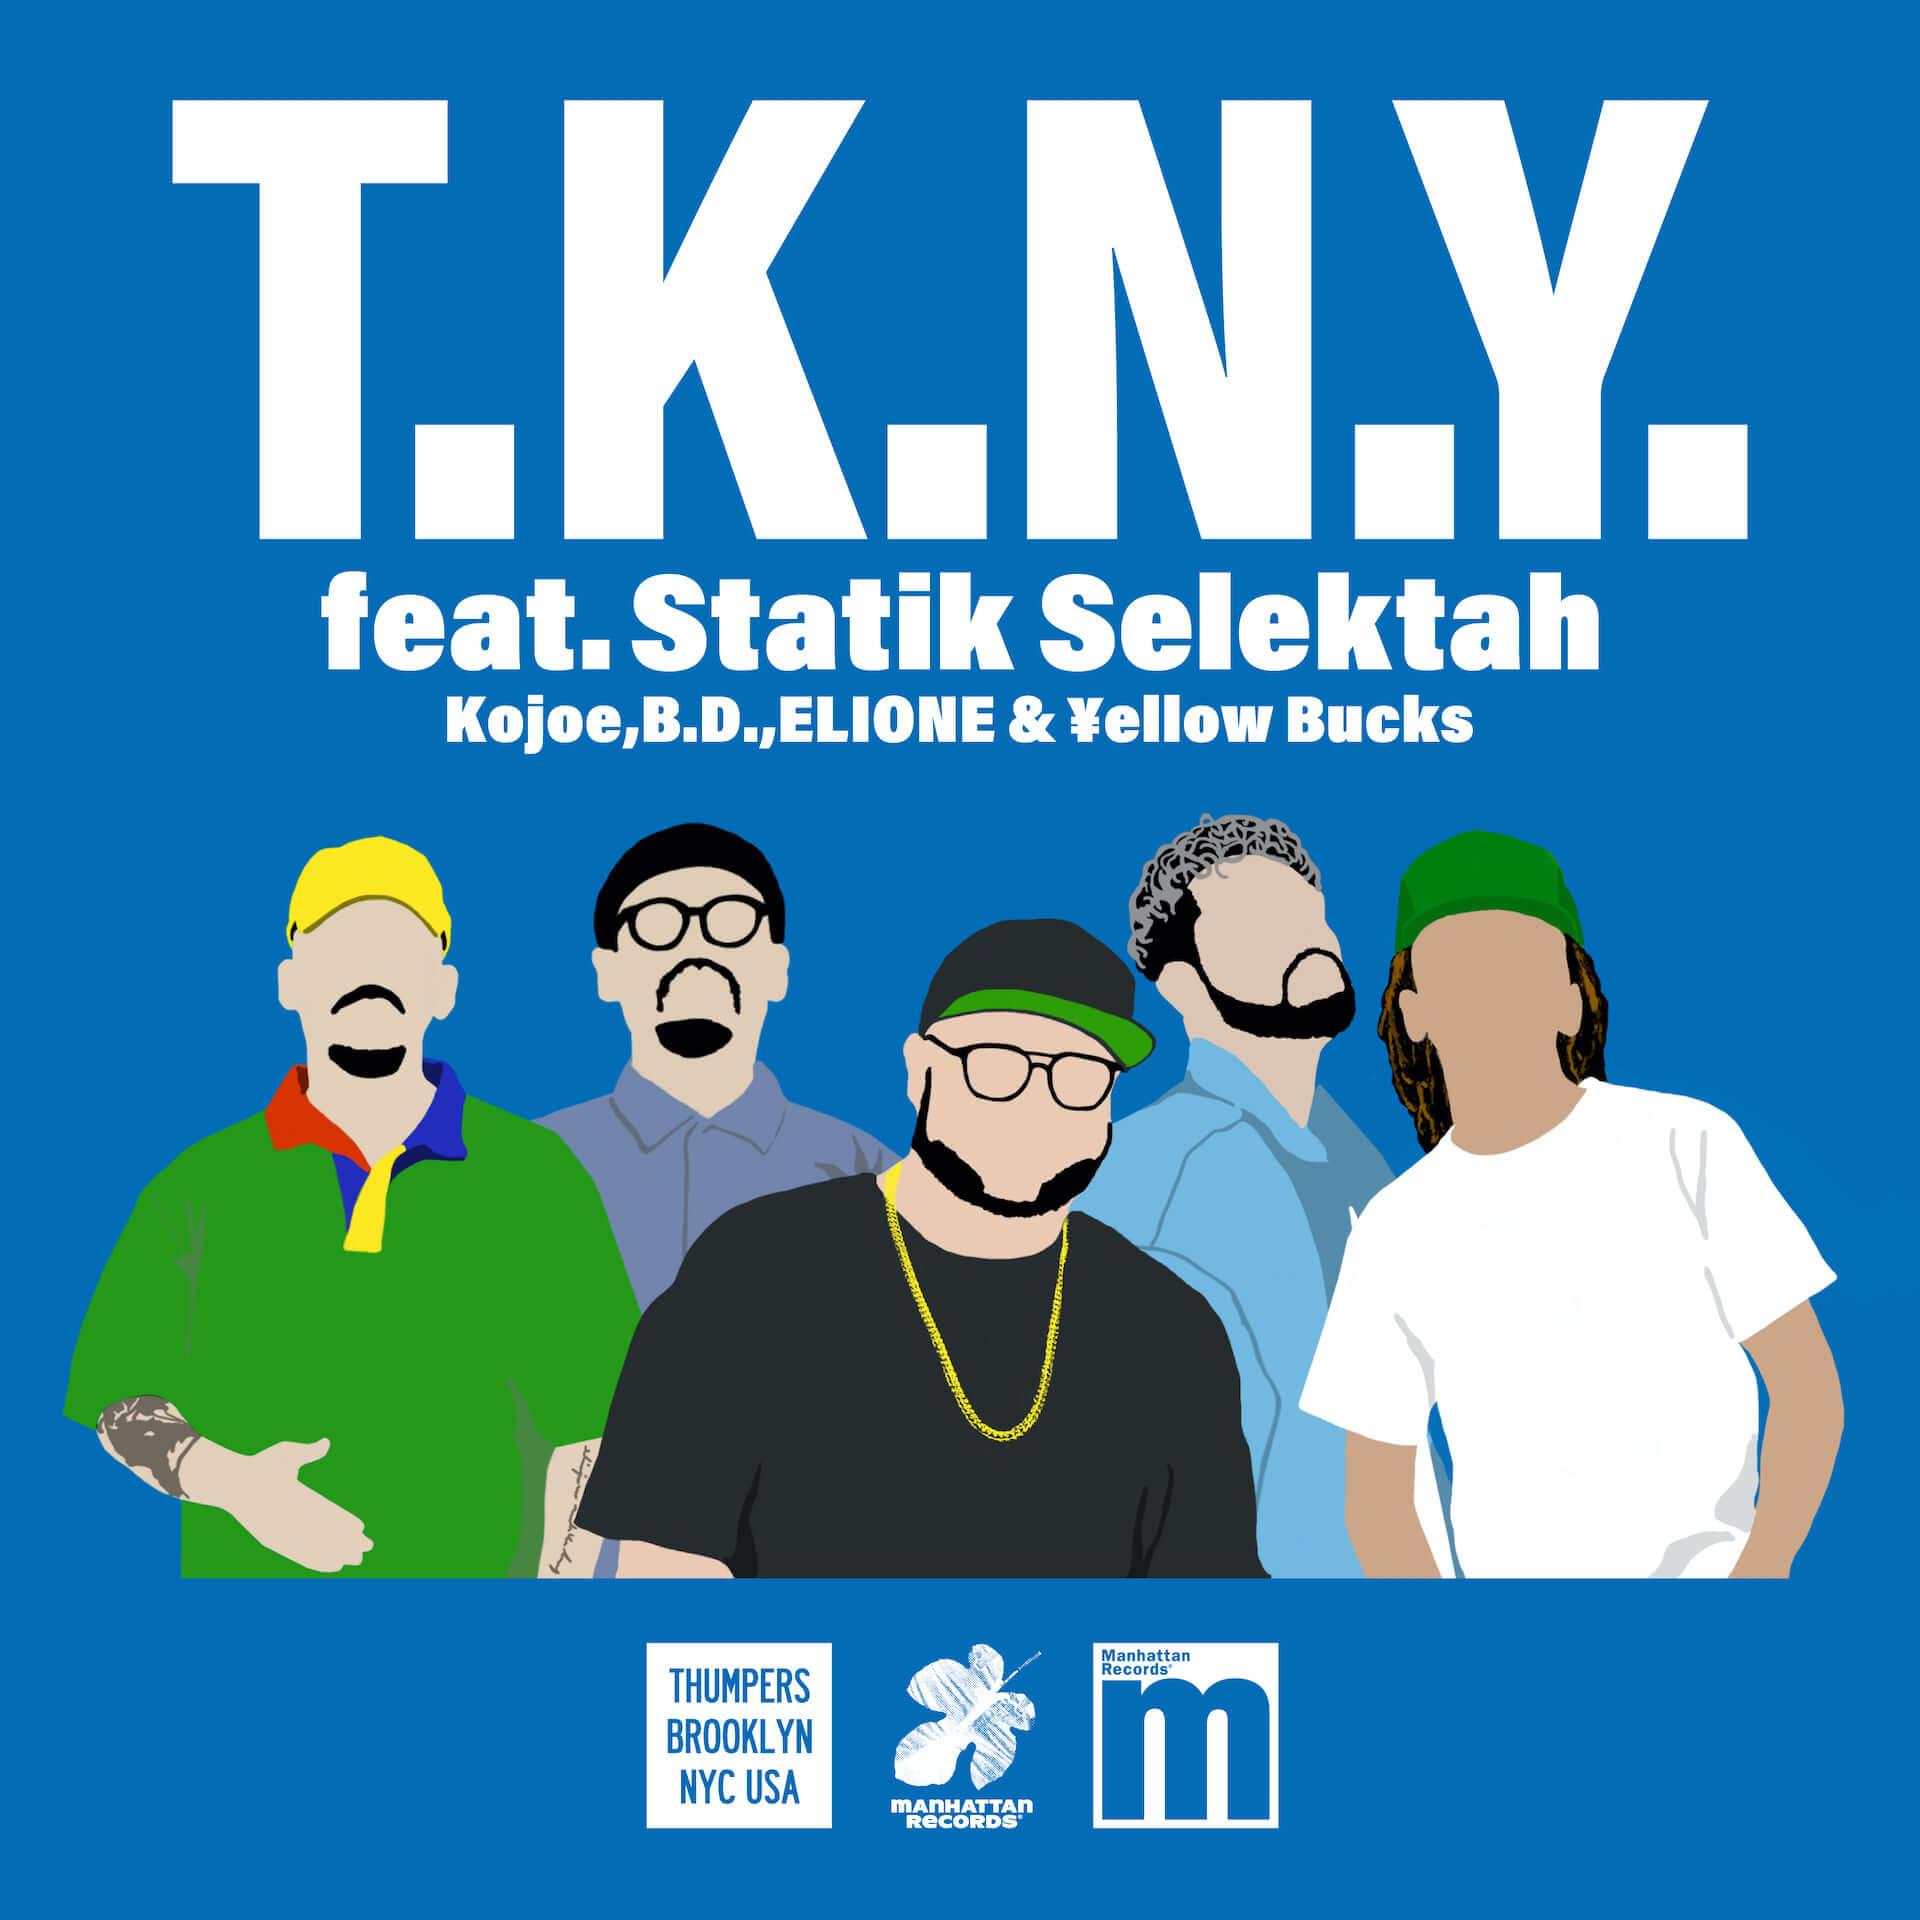 "Manhattan RecordsとTHUMPERSのコラボアイテムが登場!KOJOE、ELIONE、¥ellow Bucks、B.D.参加曲""T.K.N.Y.""のMVも公開 music200903_thumpers-manhattanrecords_4-1920x1920"